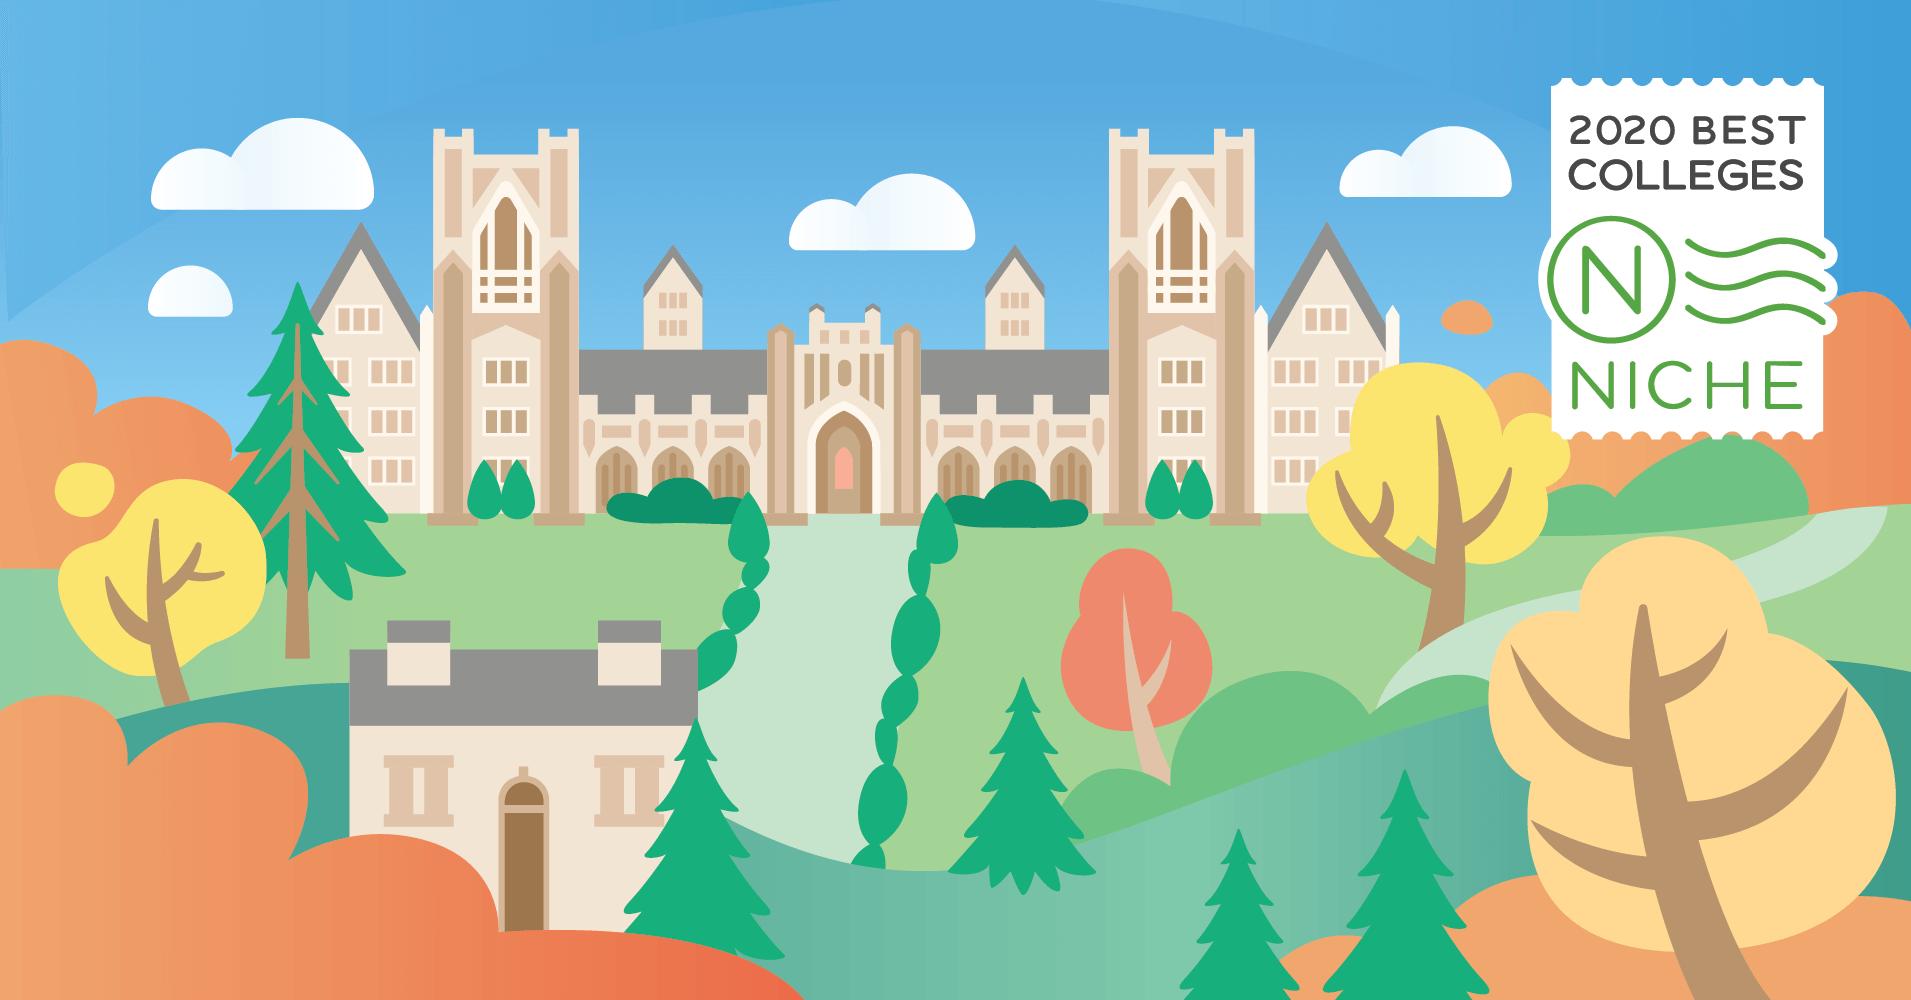 Best Colleges 2020.2020 Best Colleges In America Niche